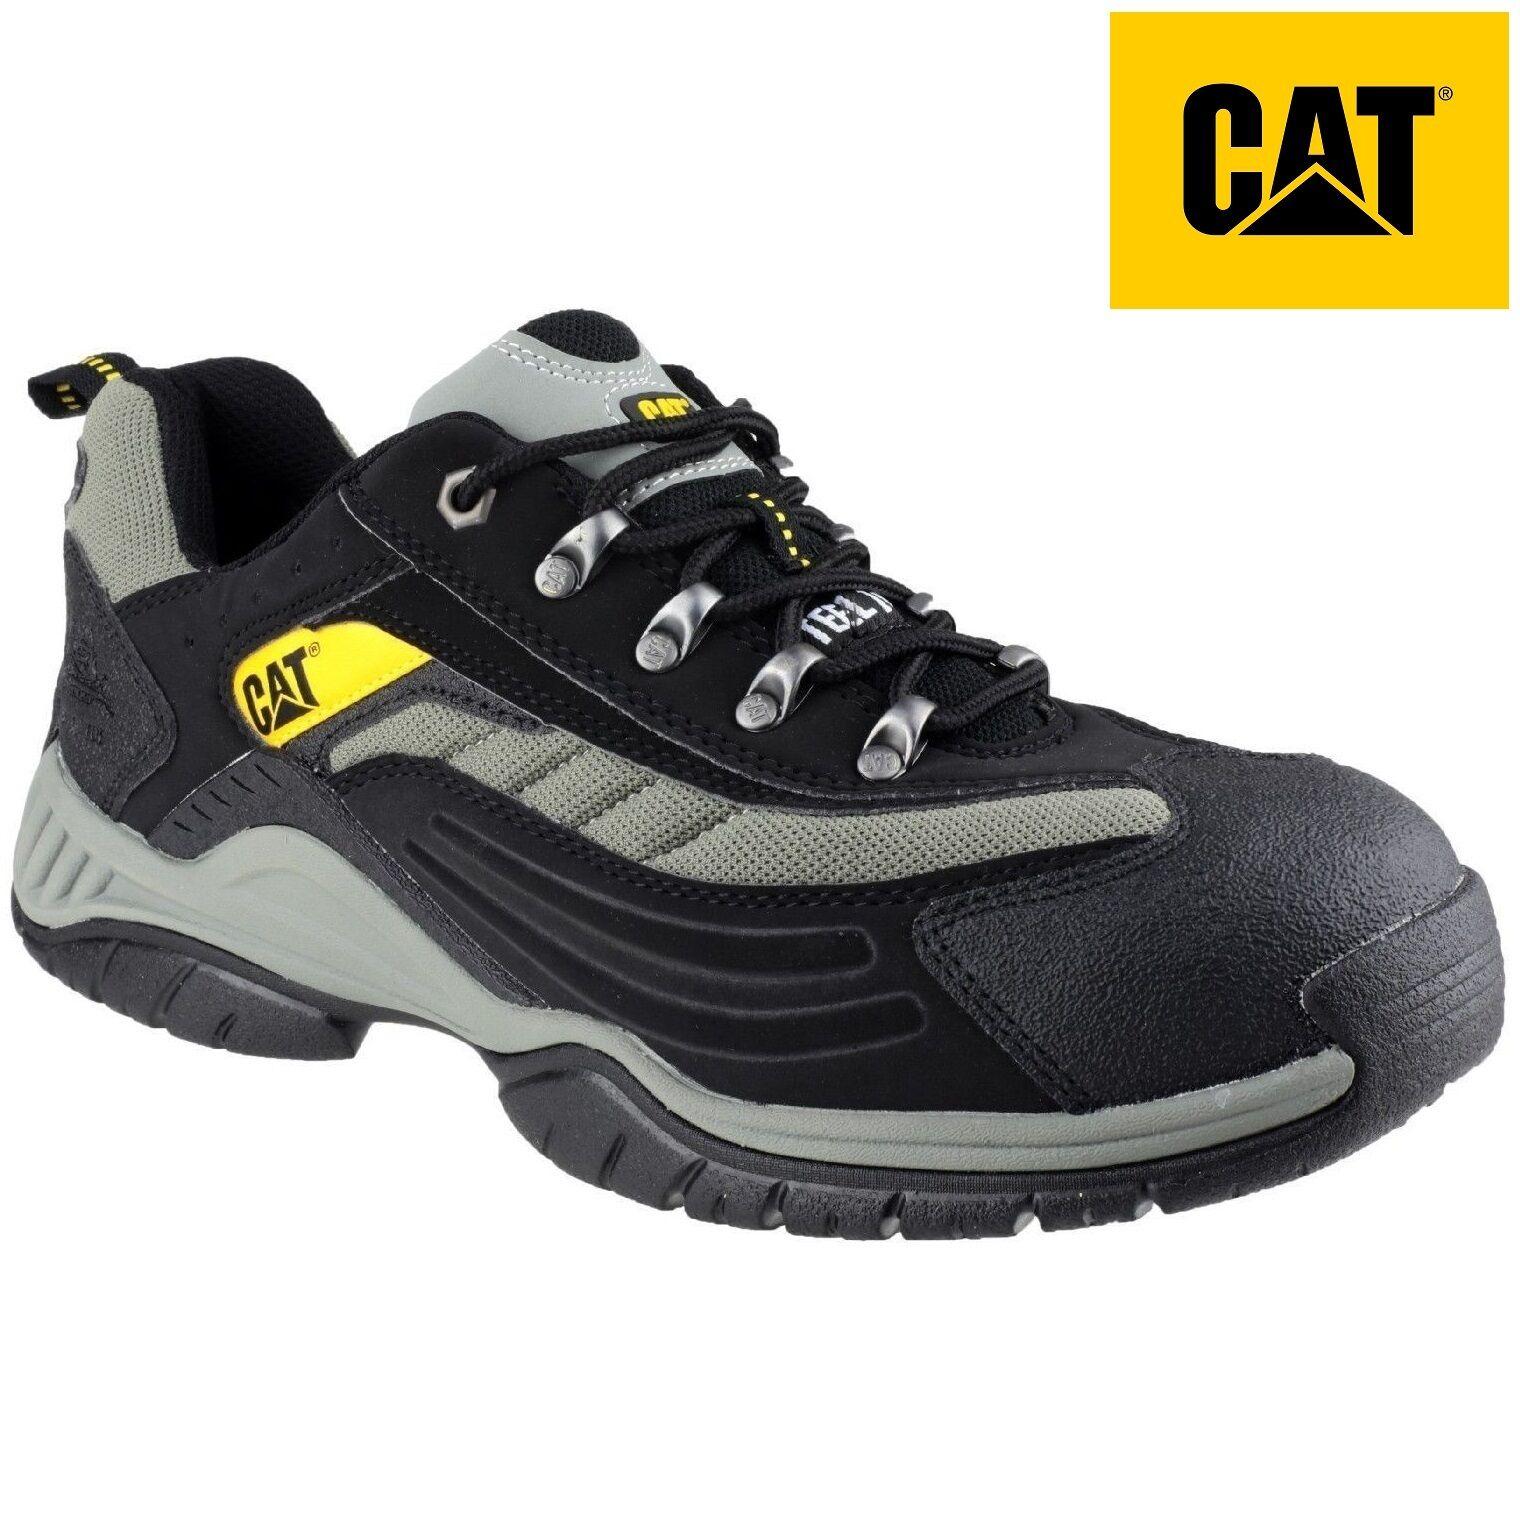 Uomo Lightweight CAT Causal CATERPILLAR Lightweight Uomo Wide Pelle Causal CAT NON   ad5c2a